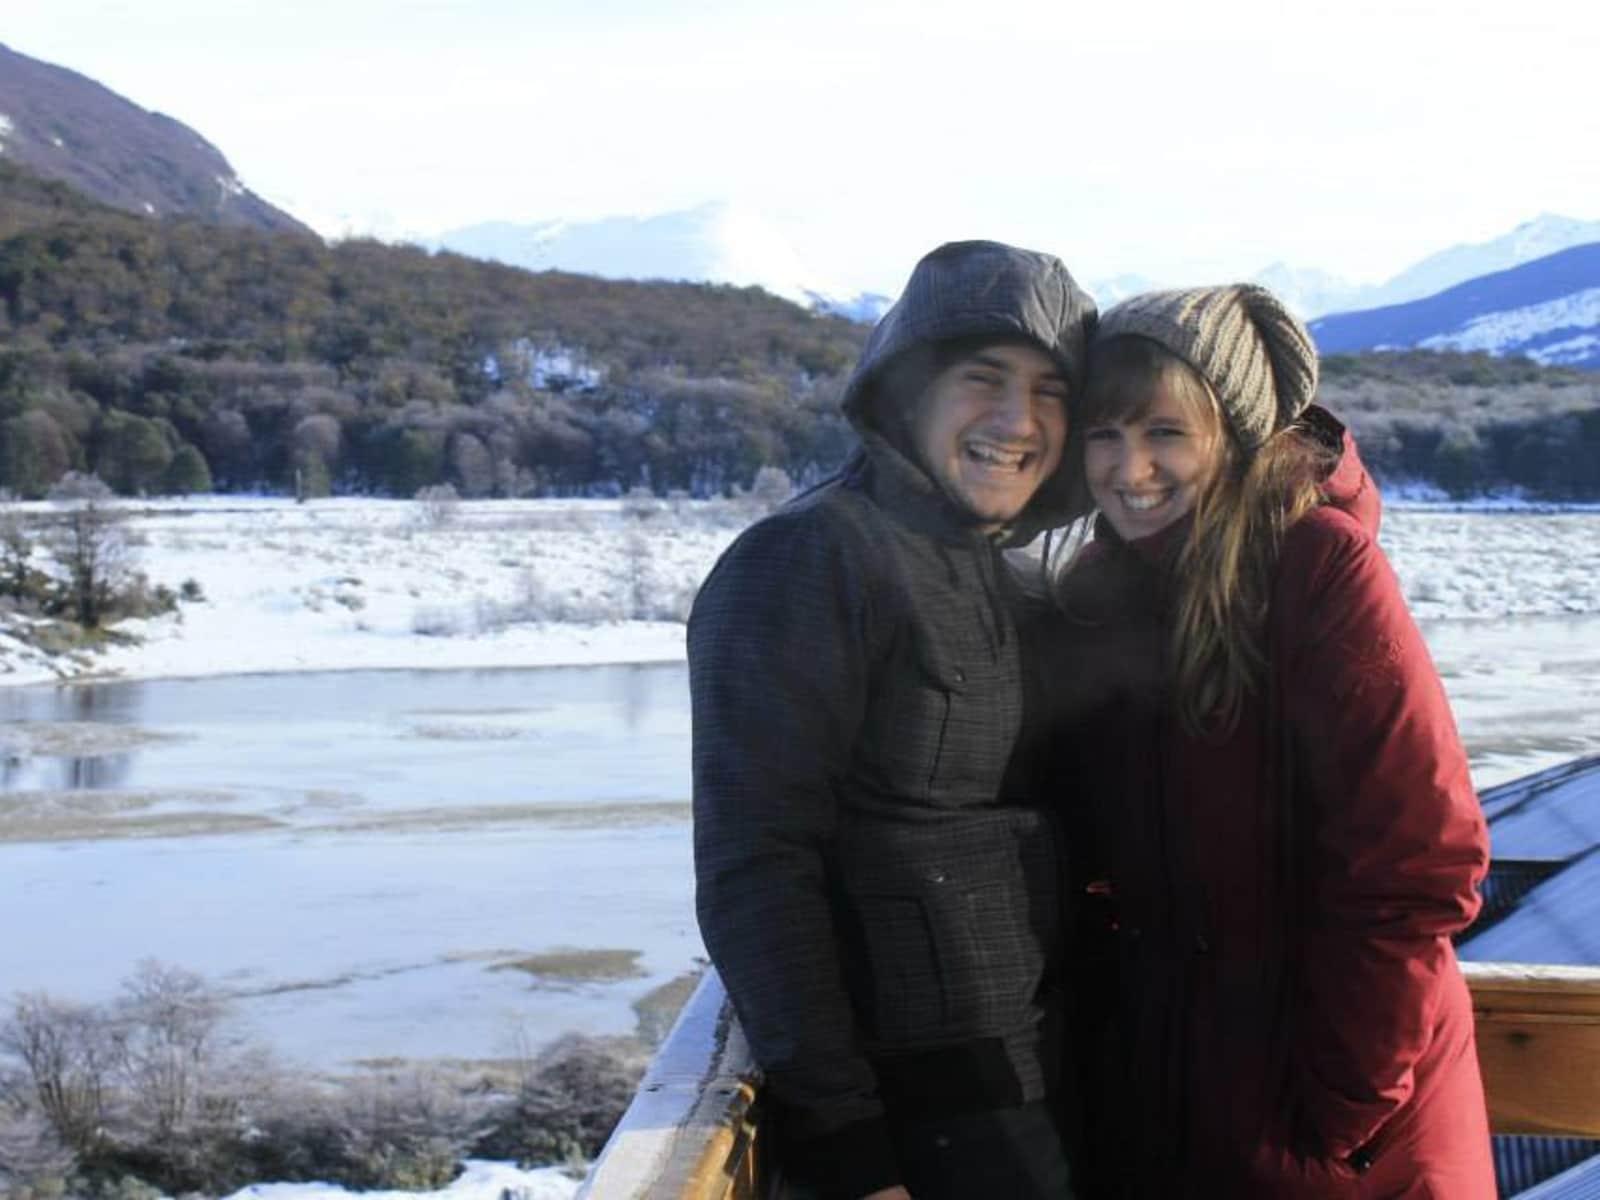 Camila julia & Martin from Buenos Aires, Argentina